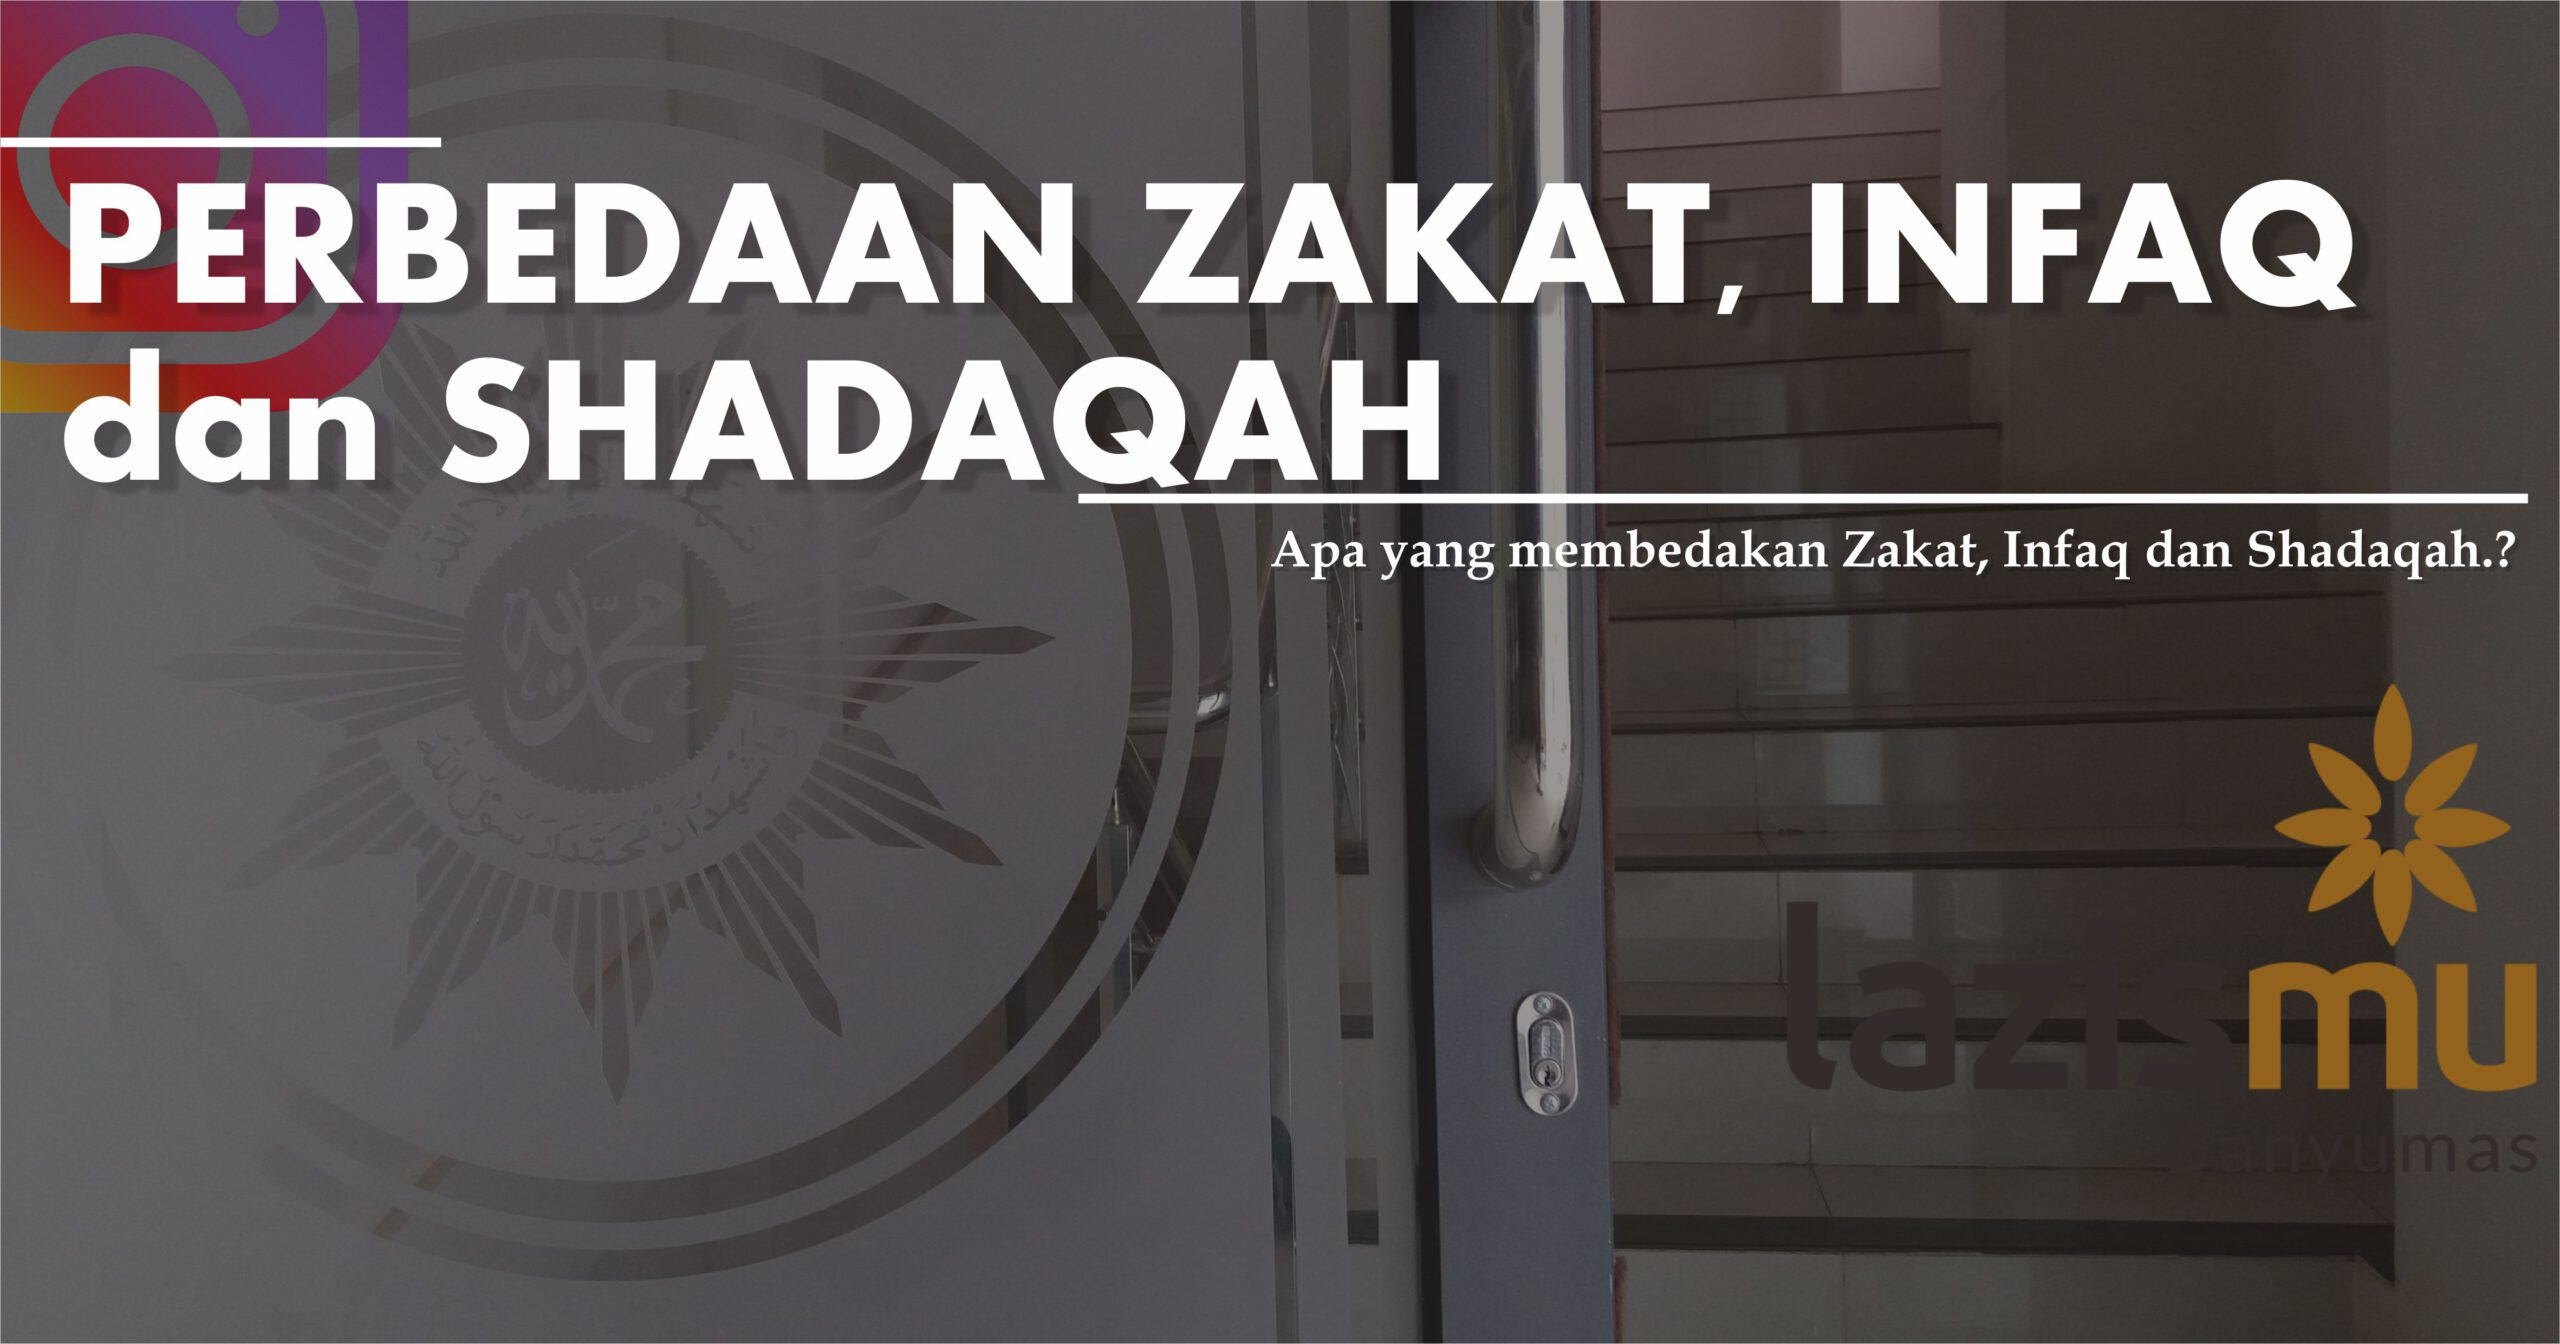 Perbedaan Zakat, Infaq, Shadaqah